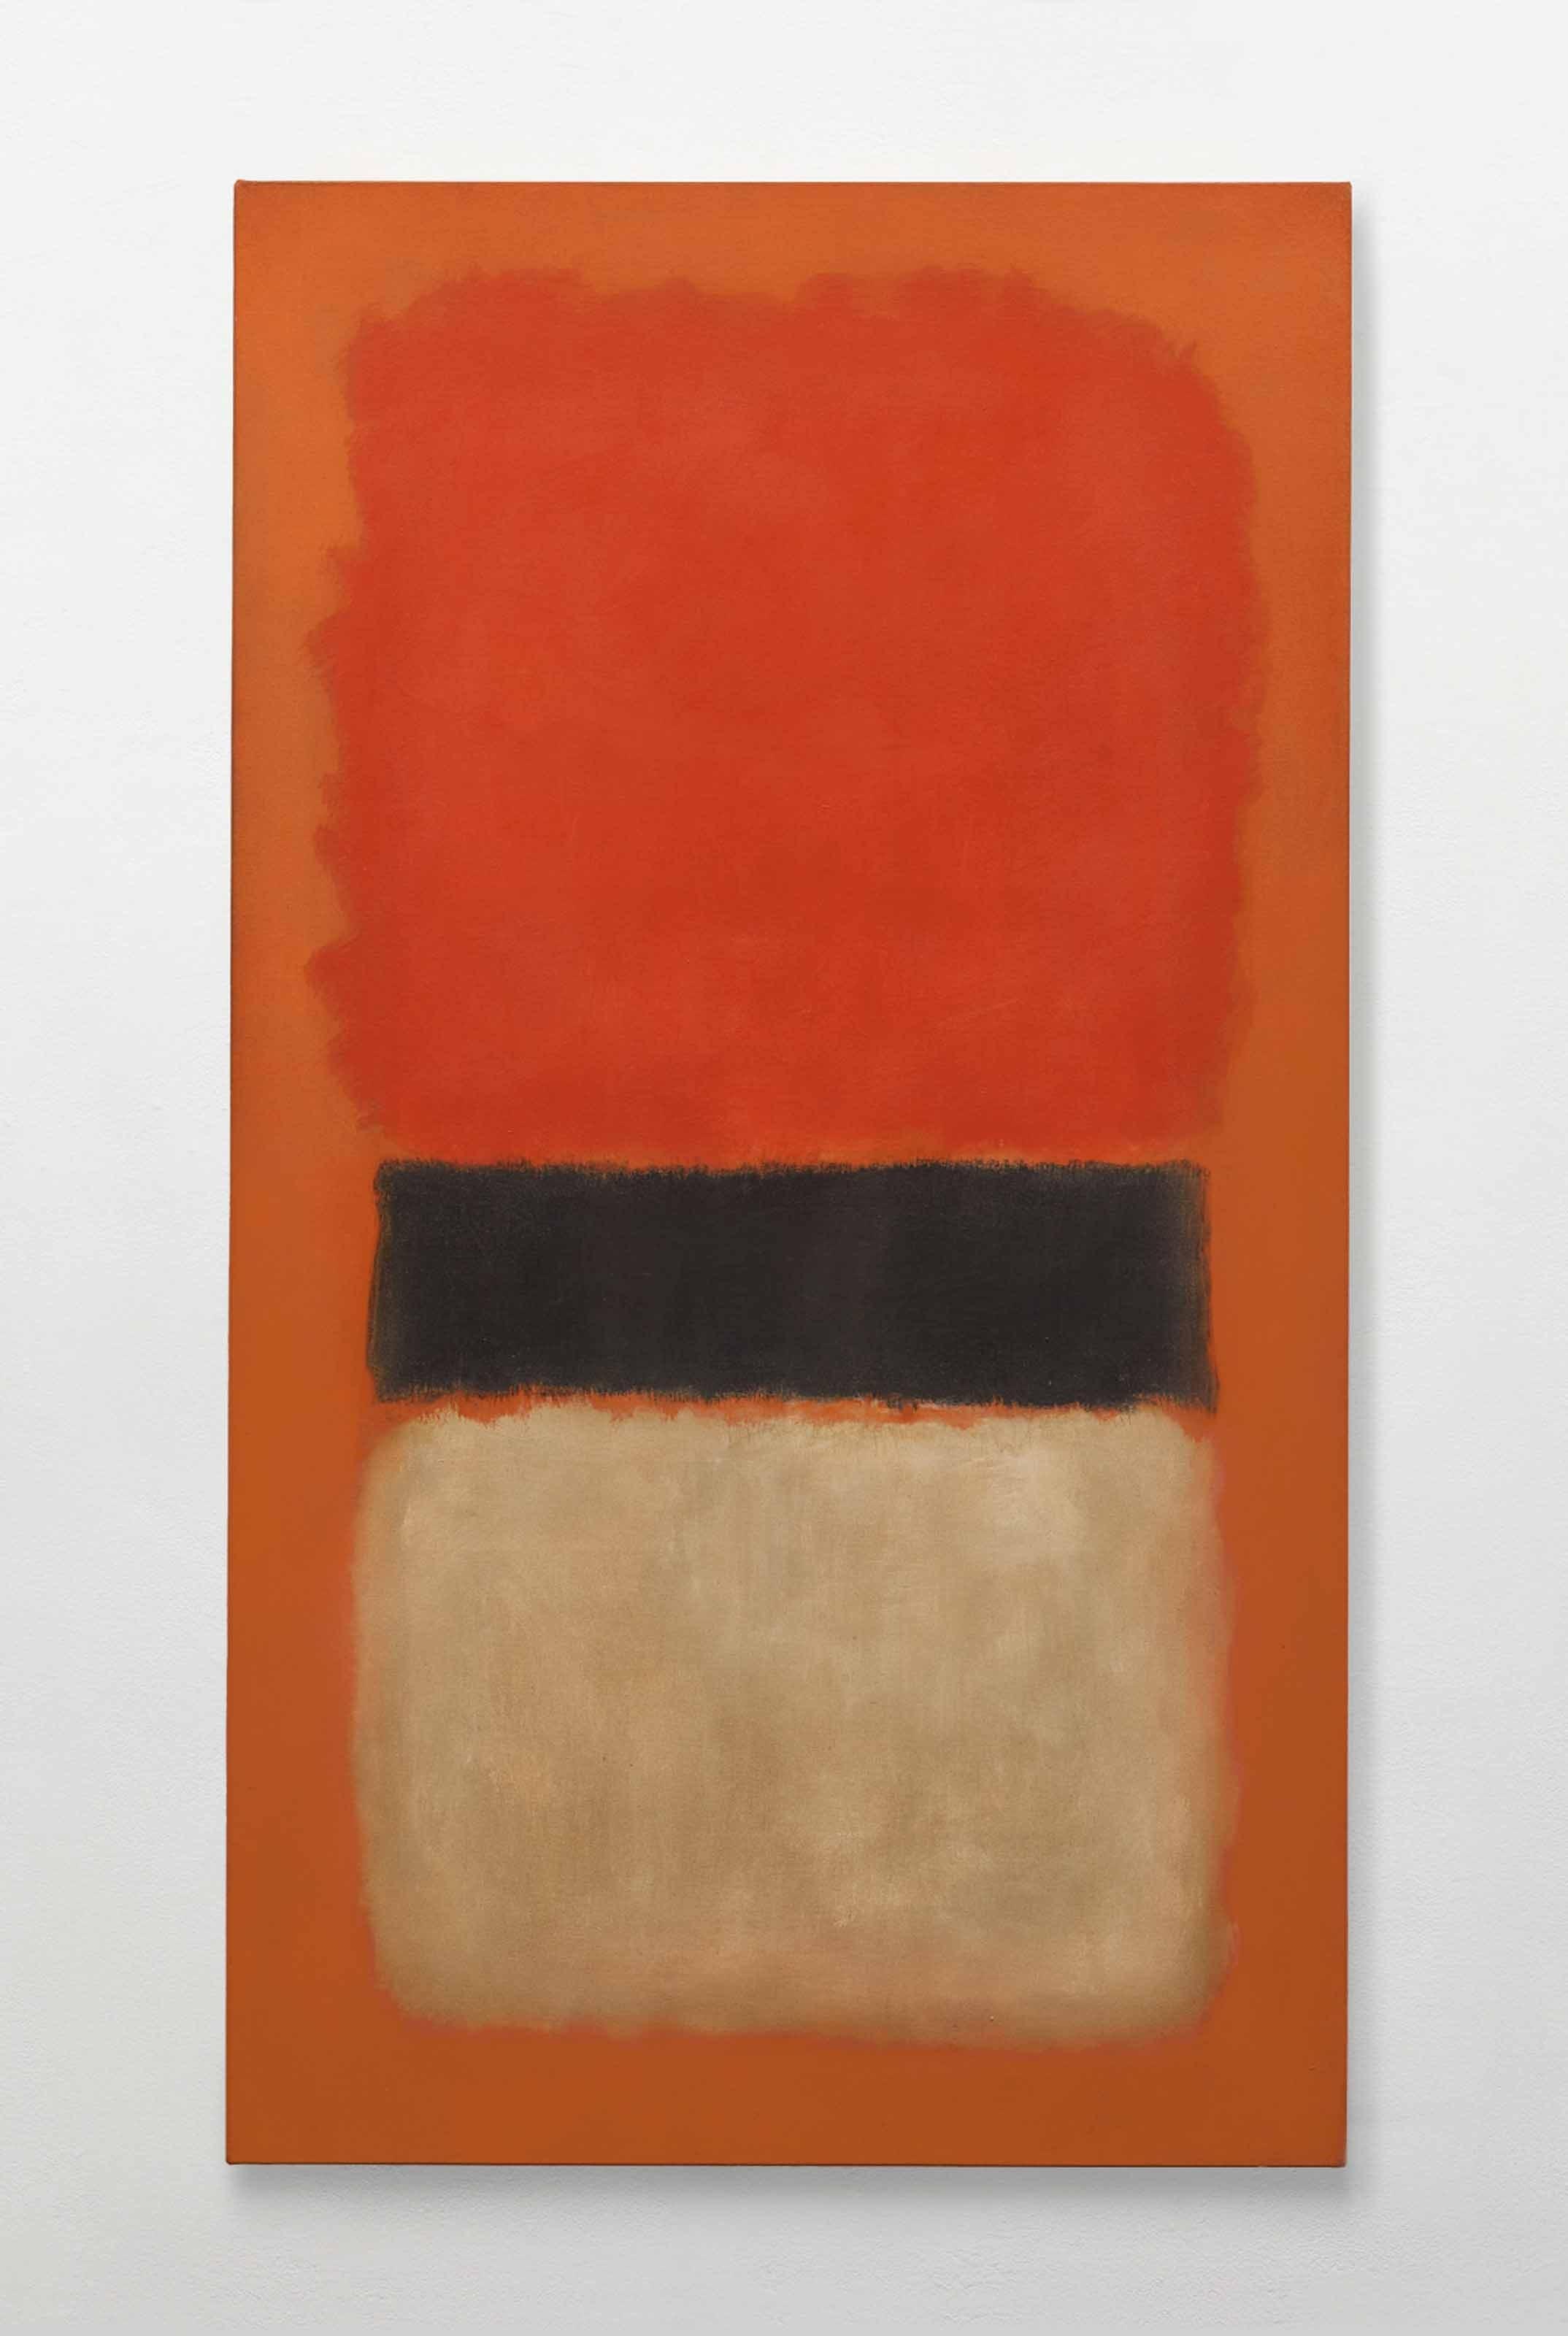 马克·罗斯科,《黑色条纹(橘色、金色和黑色)》,1957年作,173.1 x 97.5公分。2012年11月14日在佳士得纽约以21,362,500美元成交。 © 1998 Kate Rothko Prizel & Christopher Rothko ARS, NY and DACS, London